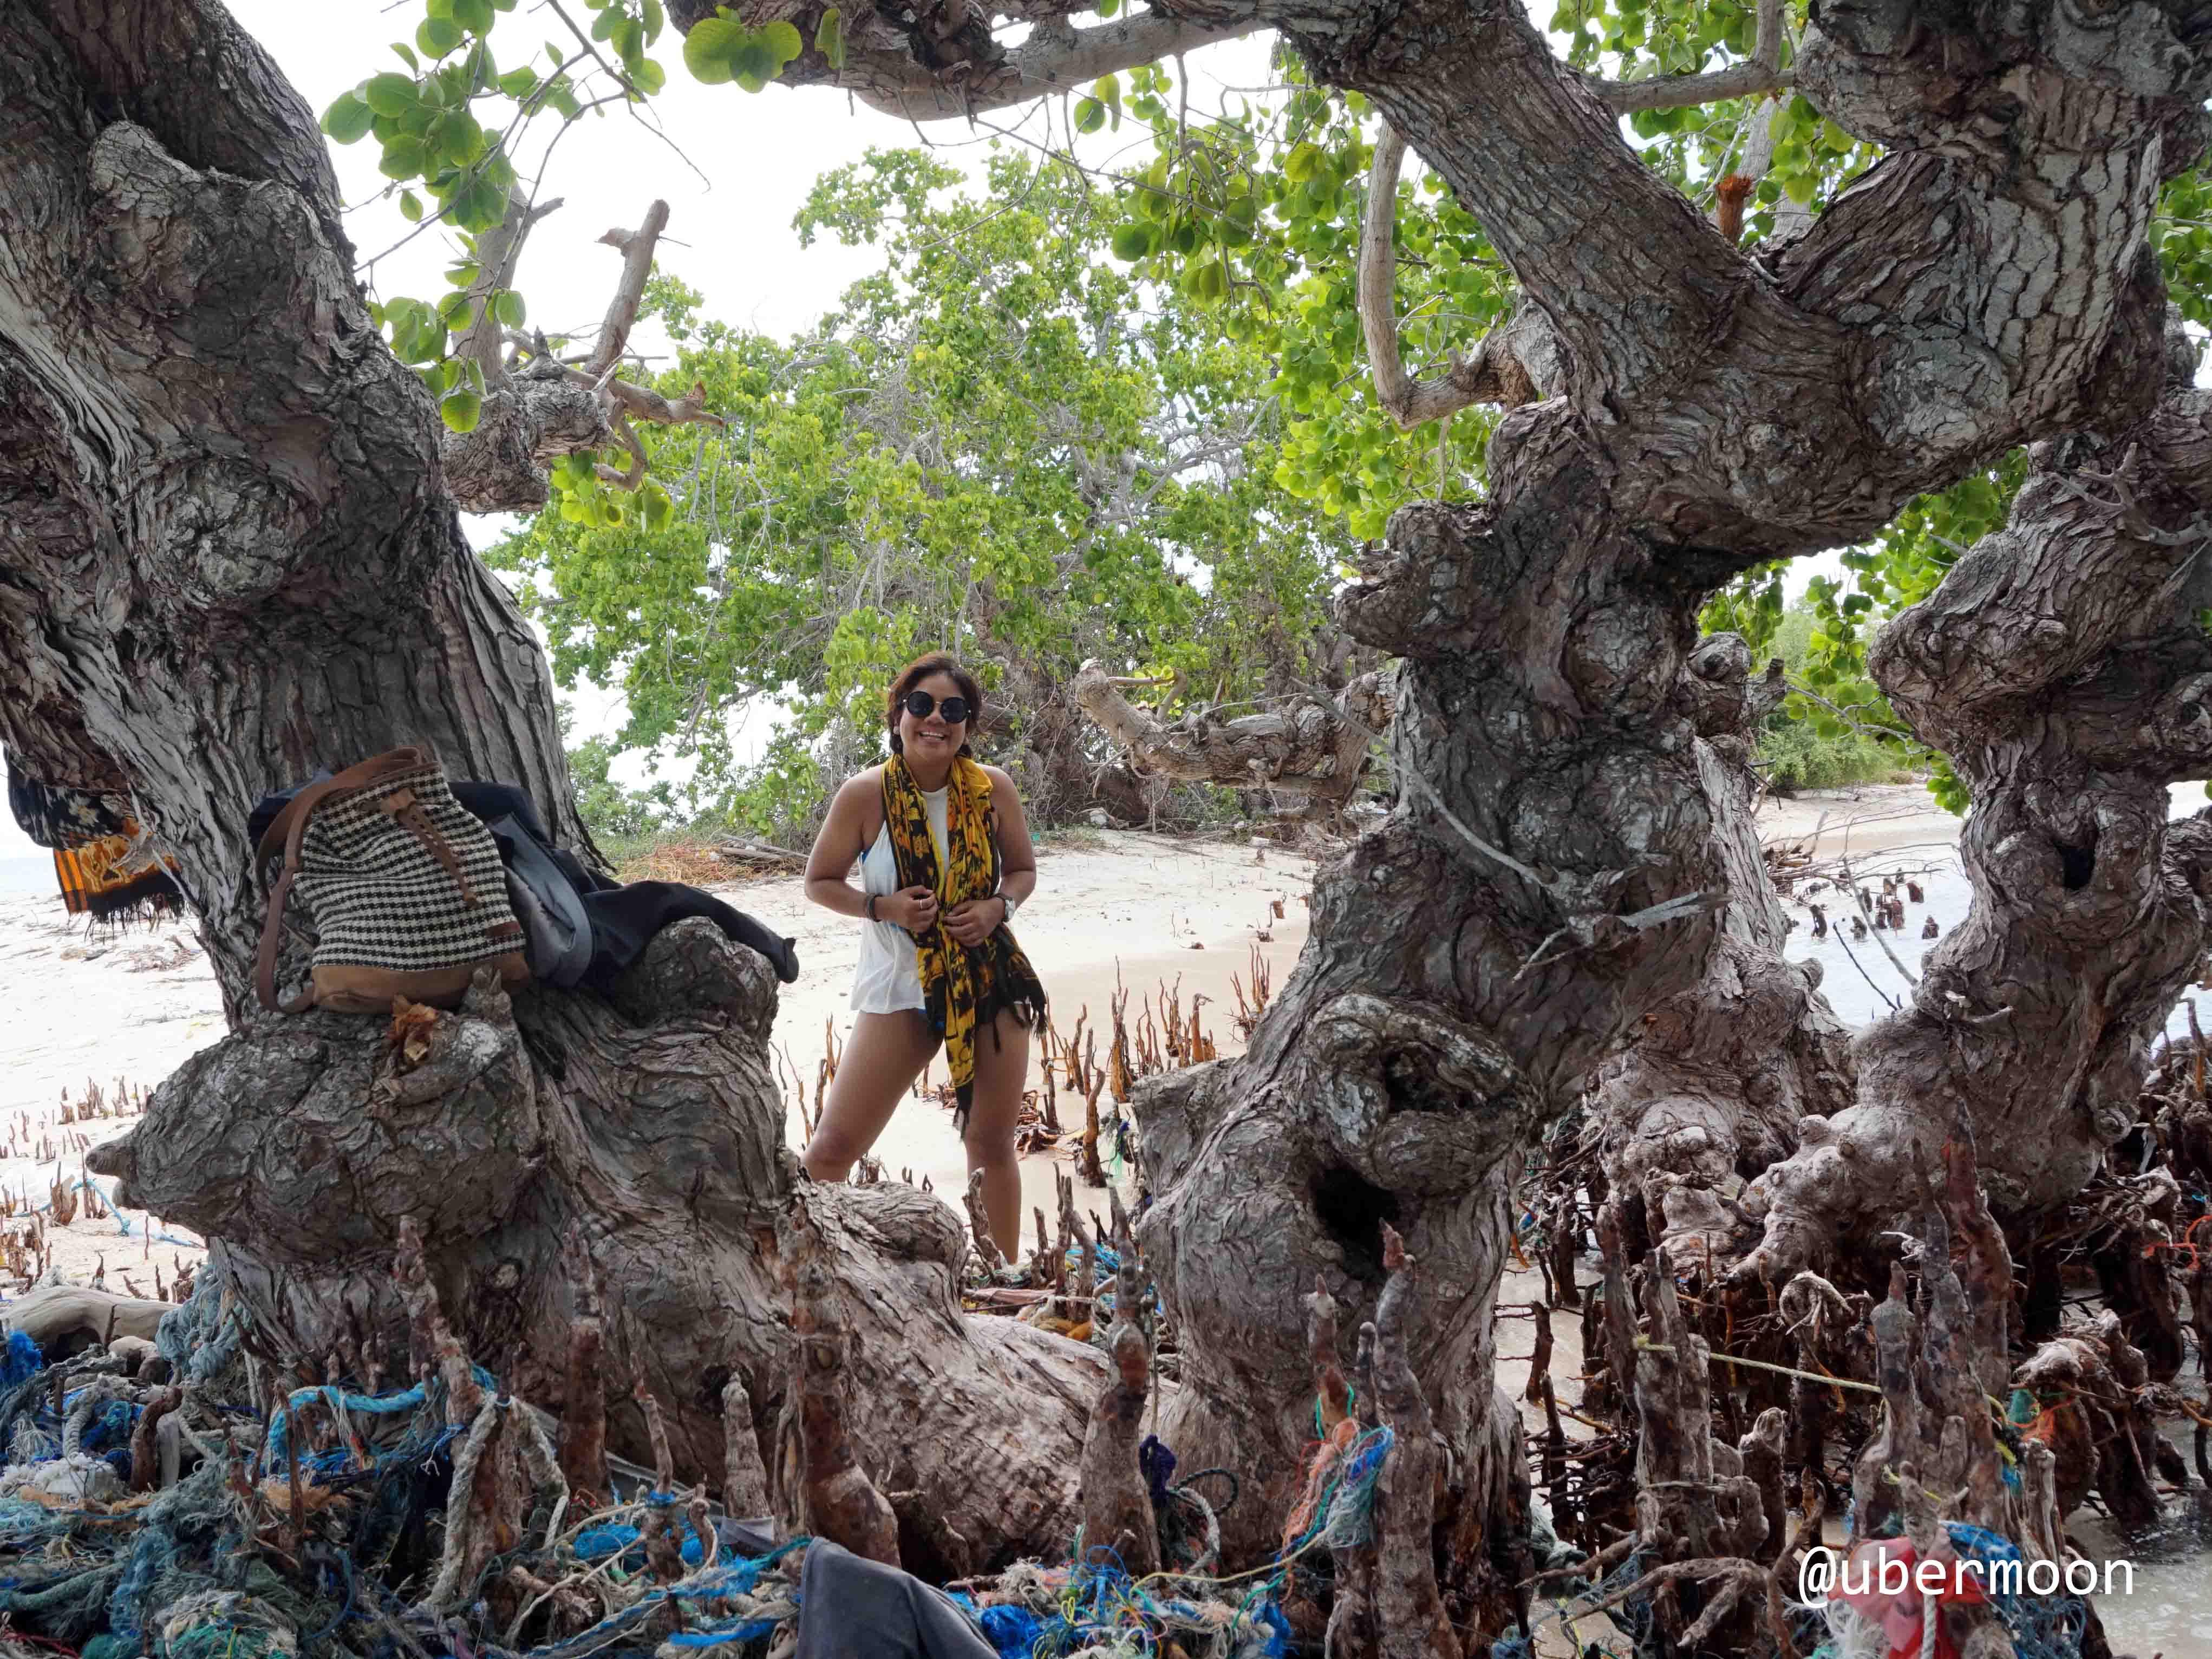 pohon-bakau-besar-tarupa-kecil-taka-bonerate